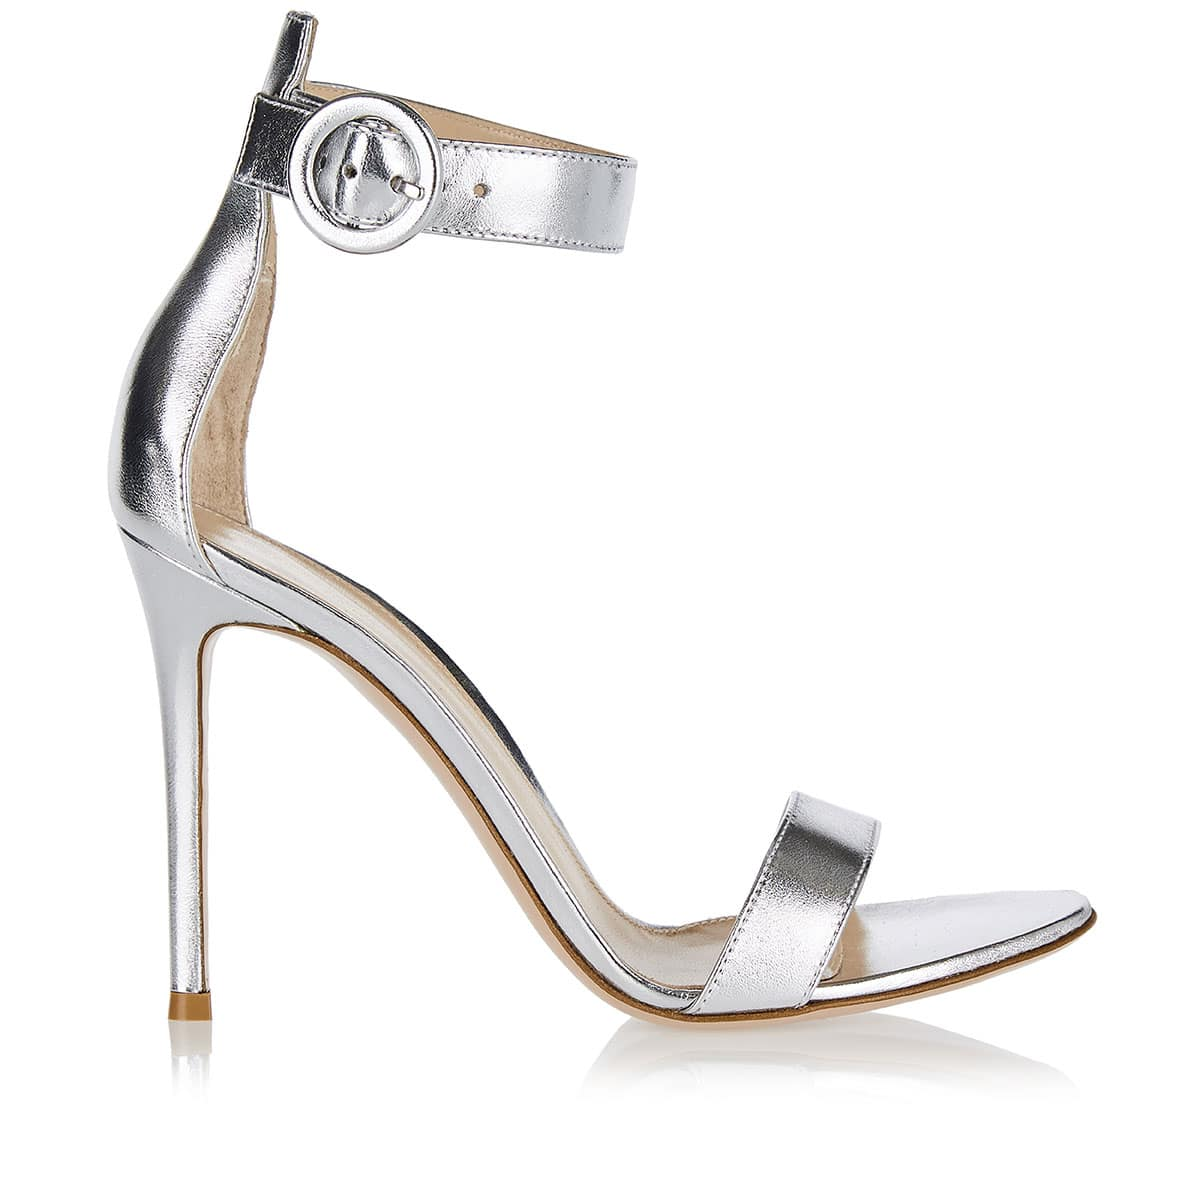 Portofino 105 metallic leather sandals